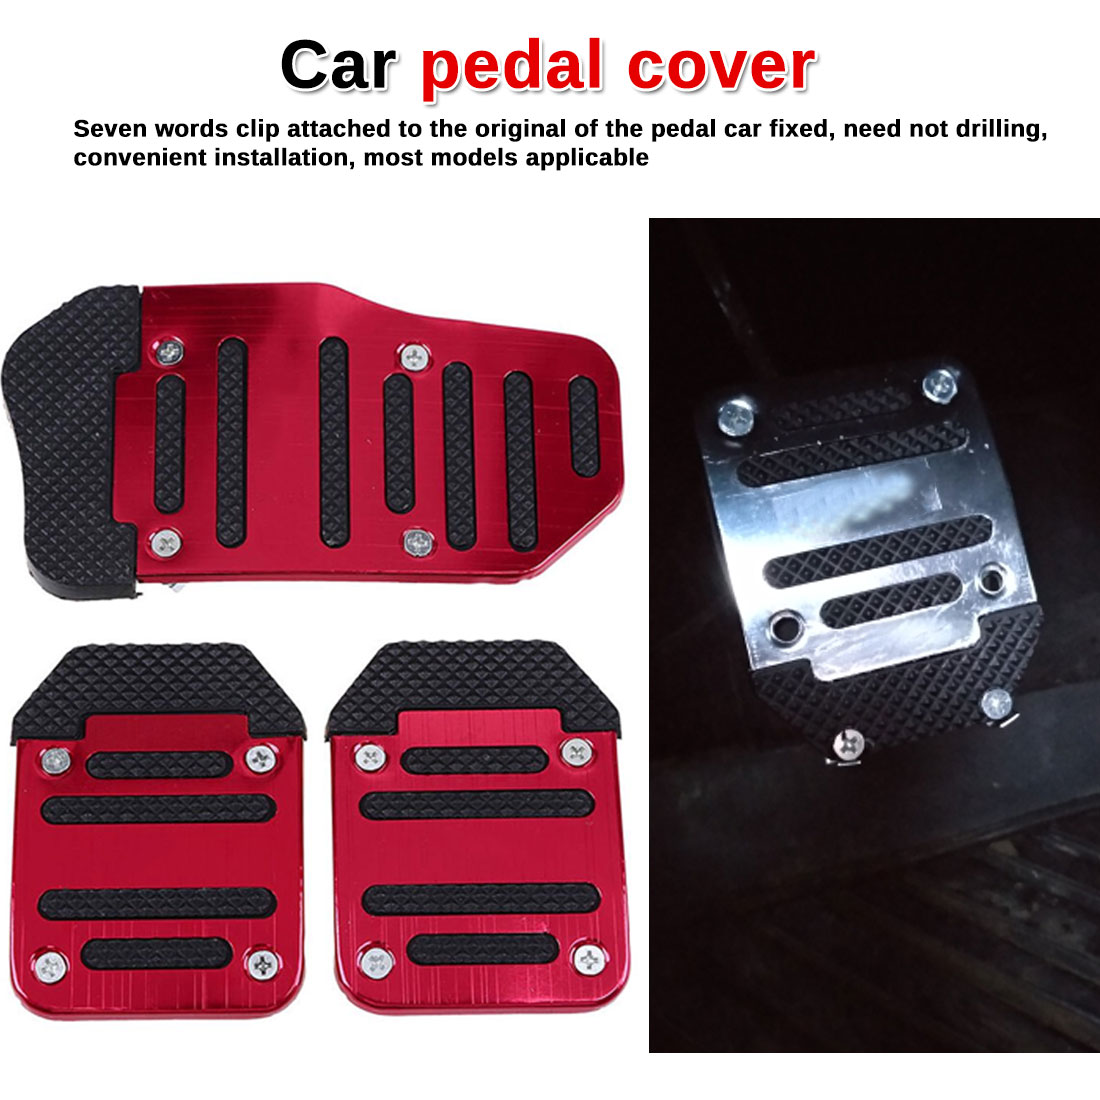 Universal Aluminium Manual Transmission Antislip Auto Pedaal Auto Rem Gaspedaal Koppelingspedaal Cover Set Kit